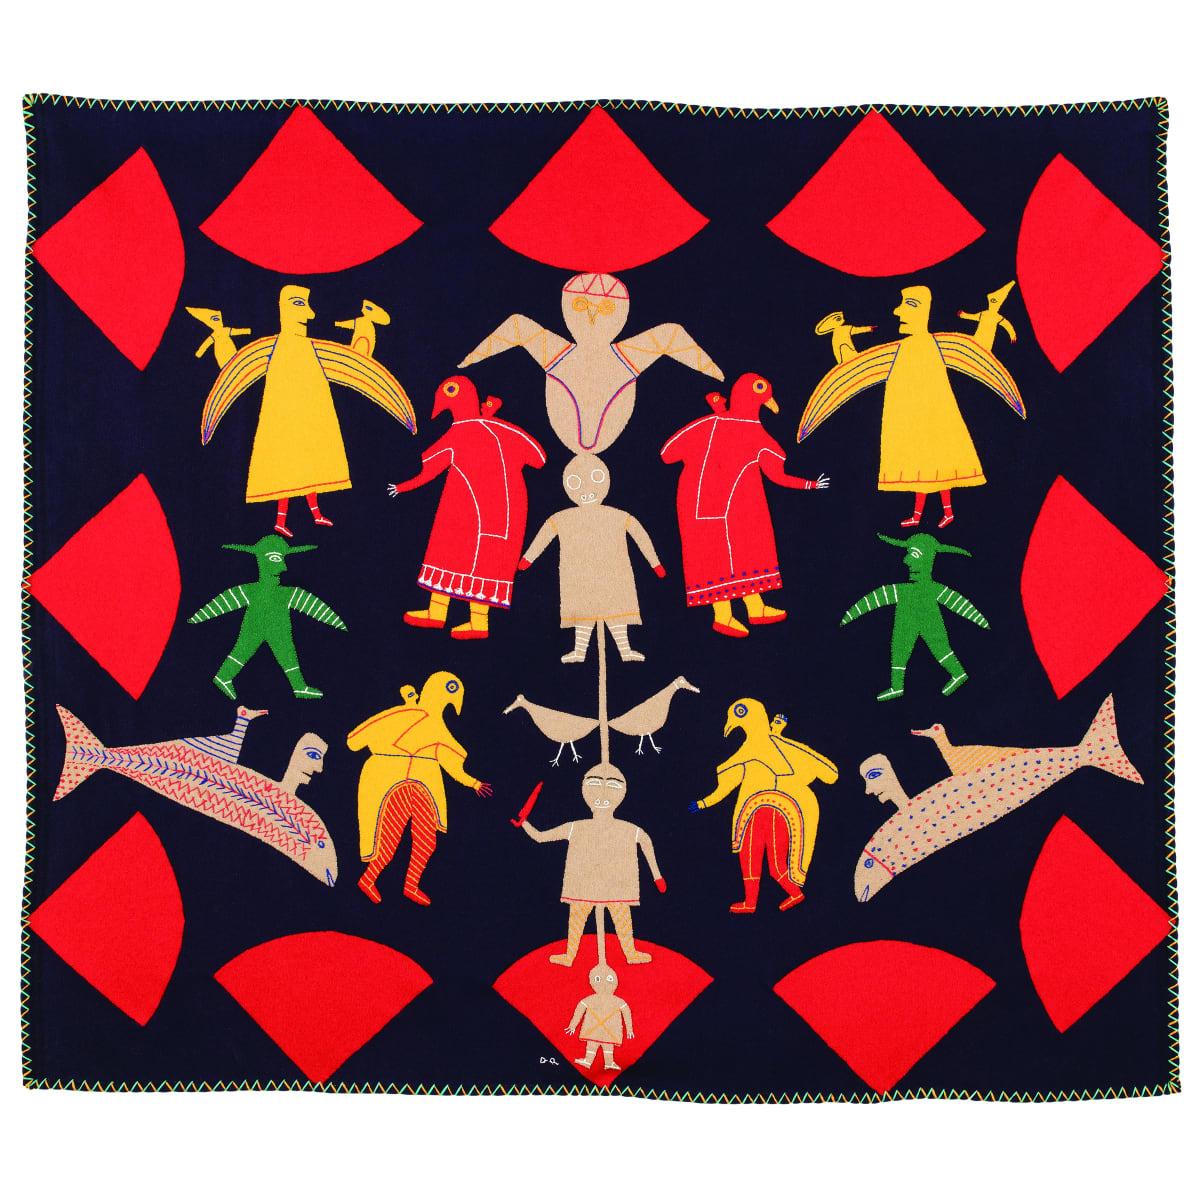 JESSIE OONARK, O.C., R.C.A (1906-1985) QAMANI'TUAQ (BAKER LAKE) Untitled (Spirit Figures), c. 1970 ESTIMATE: $40,000 — $60,000 PRICE REALIZED: $102,000